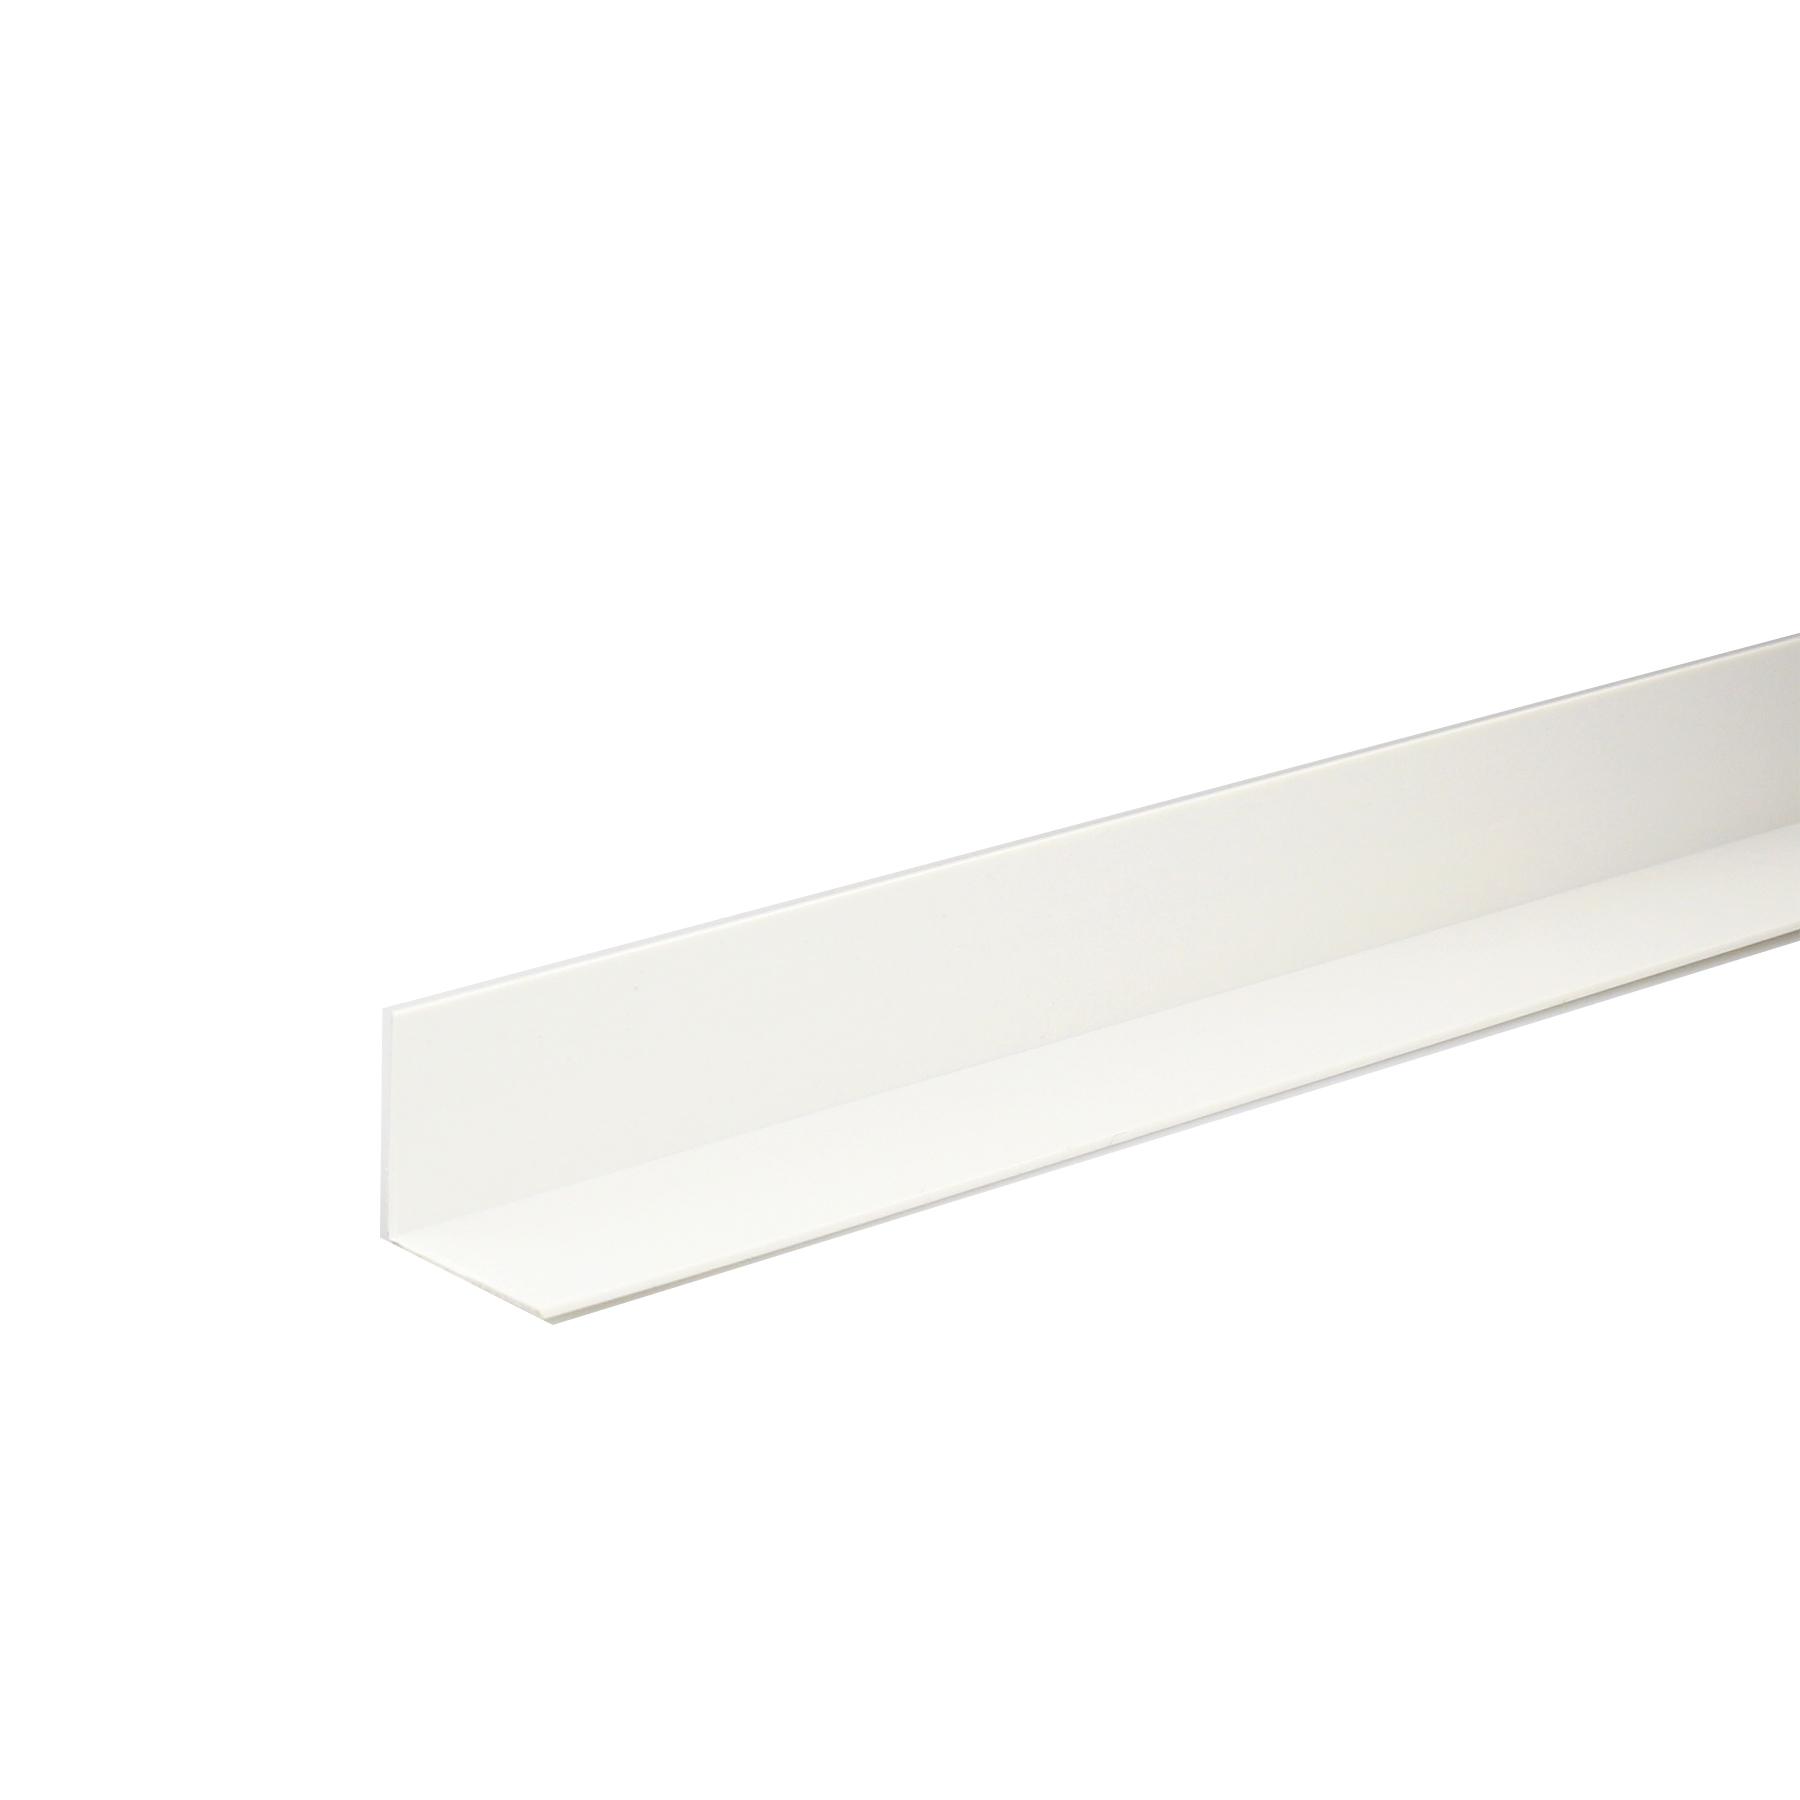 Perfil L PVC Porcelana 1mx2cm